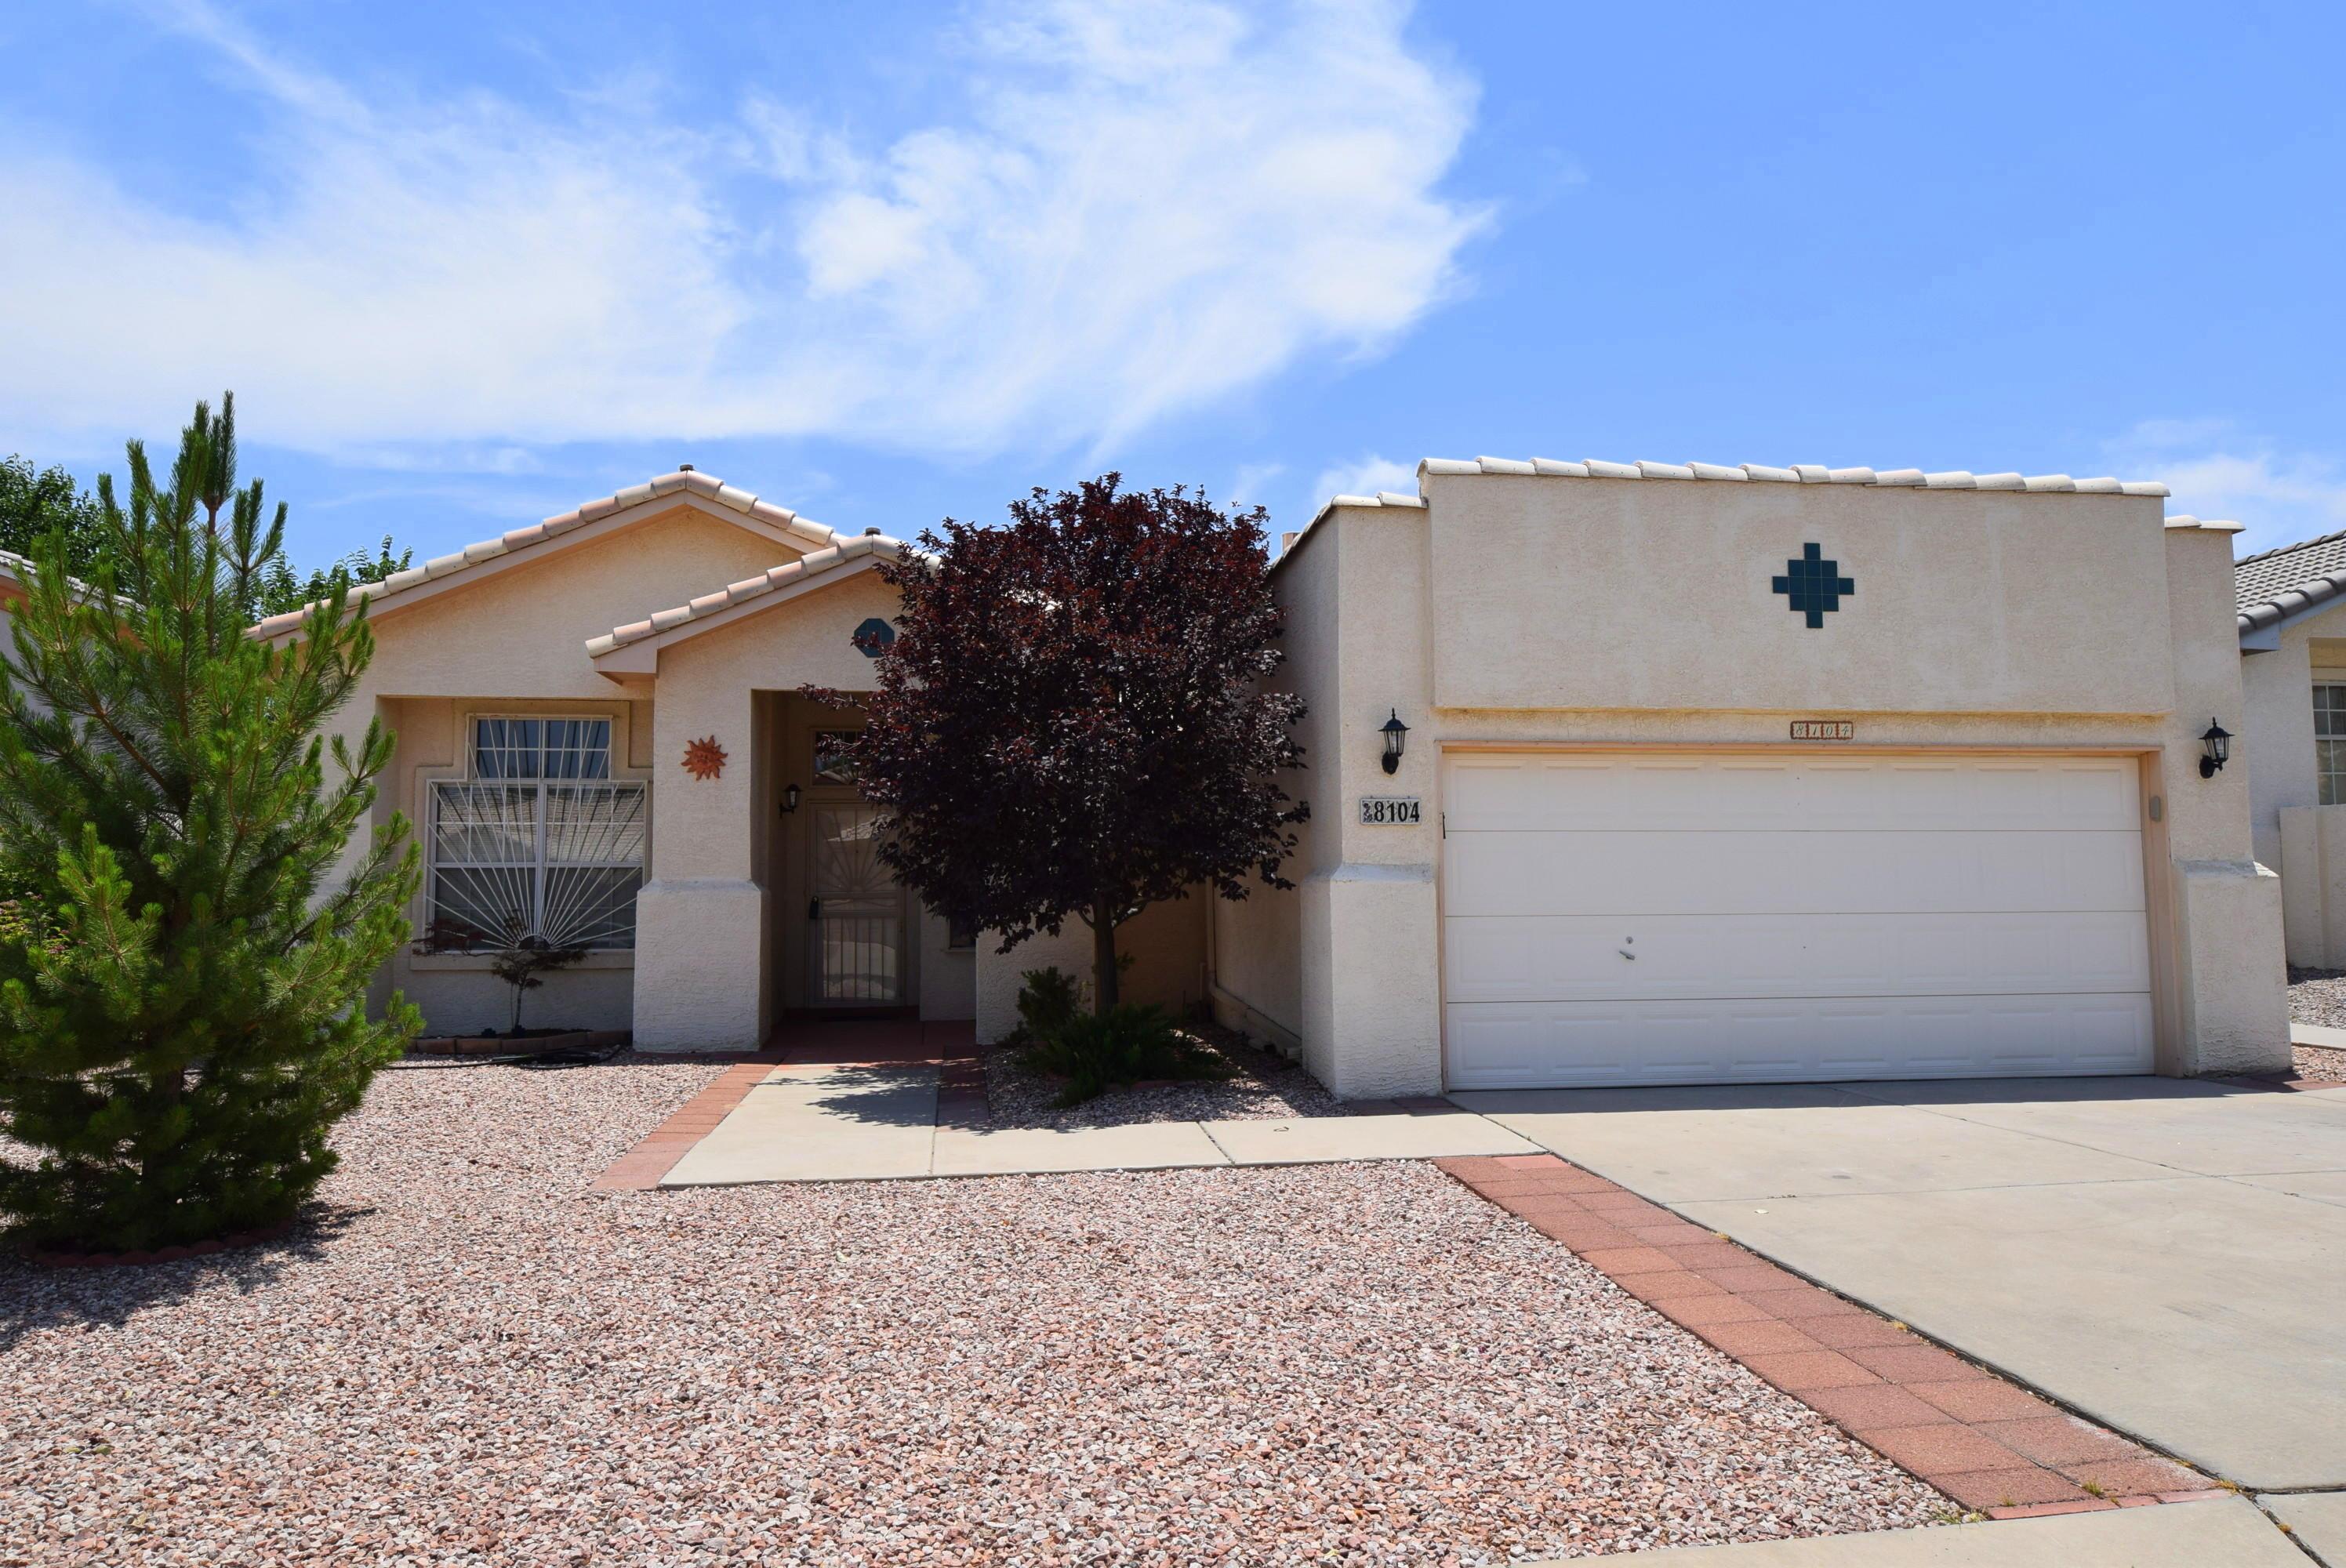 8104 CORTE DE AGUILA, Albuquerque NM 87120